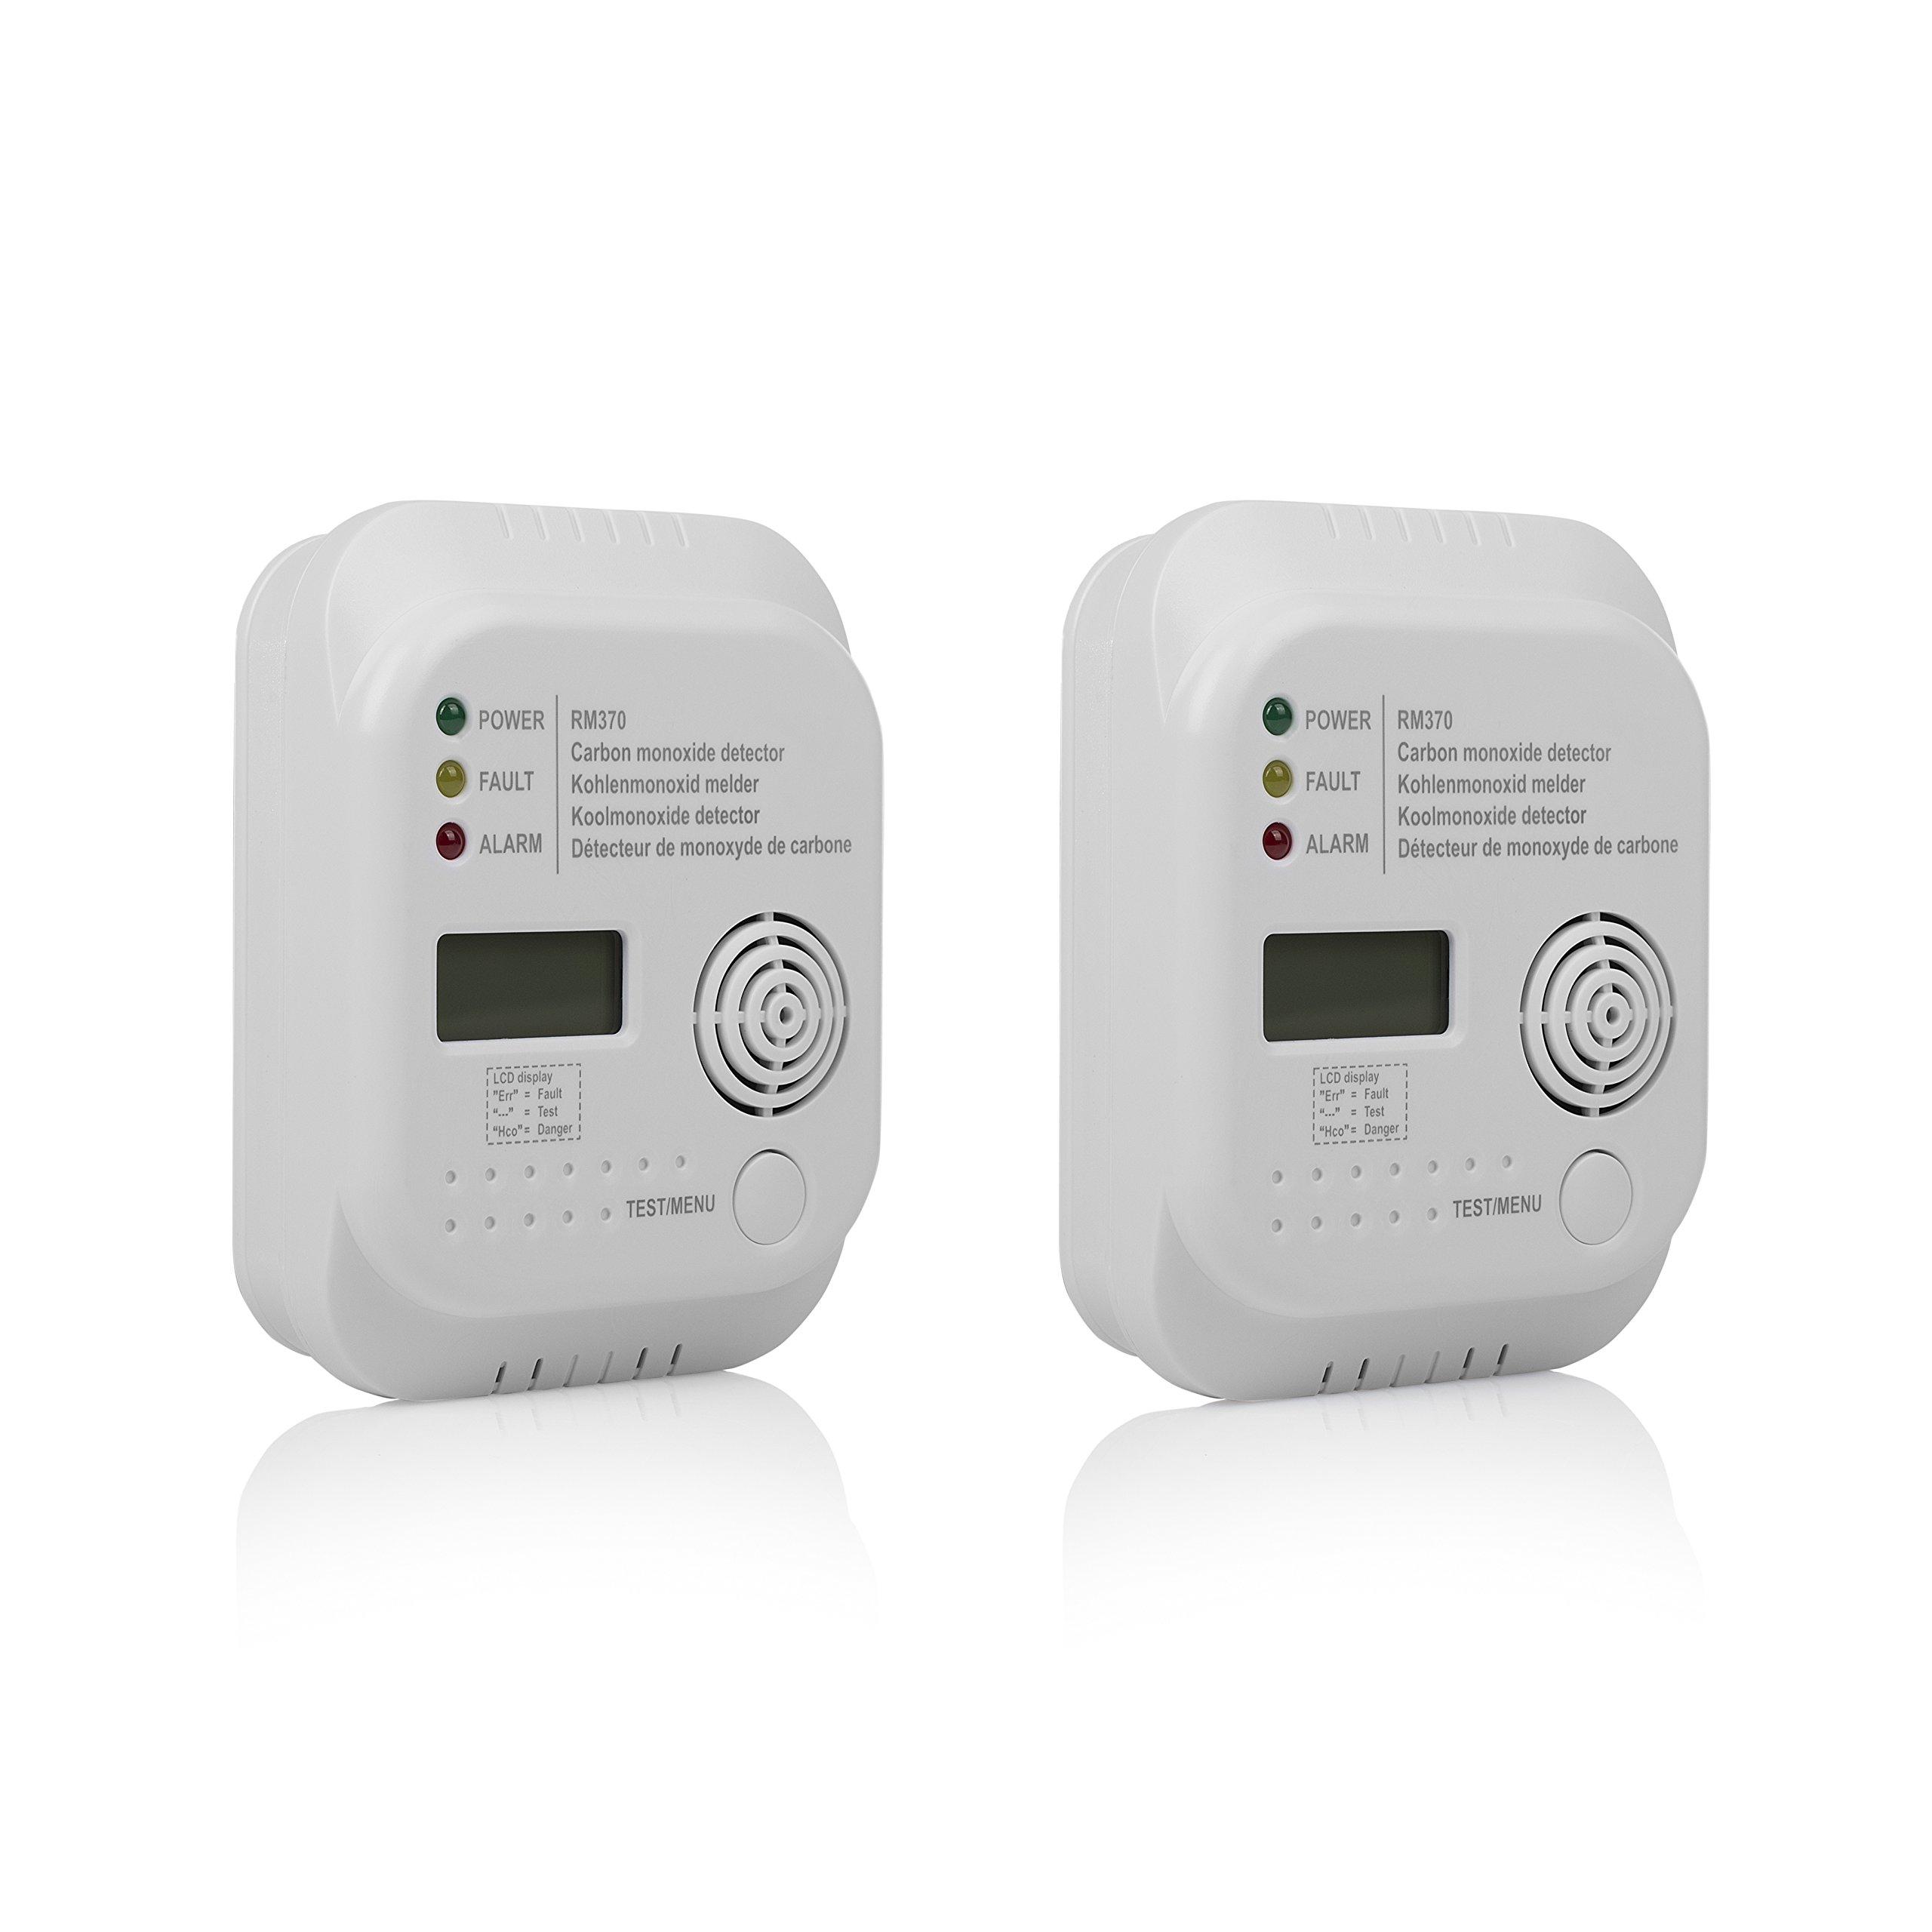 Smartwares 10.100.77 Detector de Monóxido de Carbono, 4.5 V, Blanco, 2